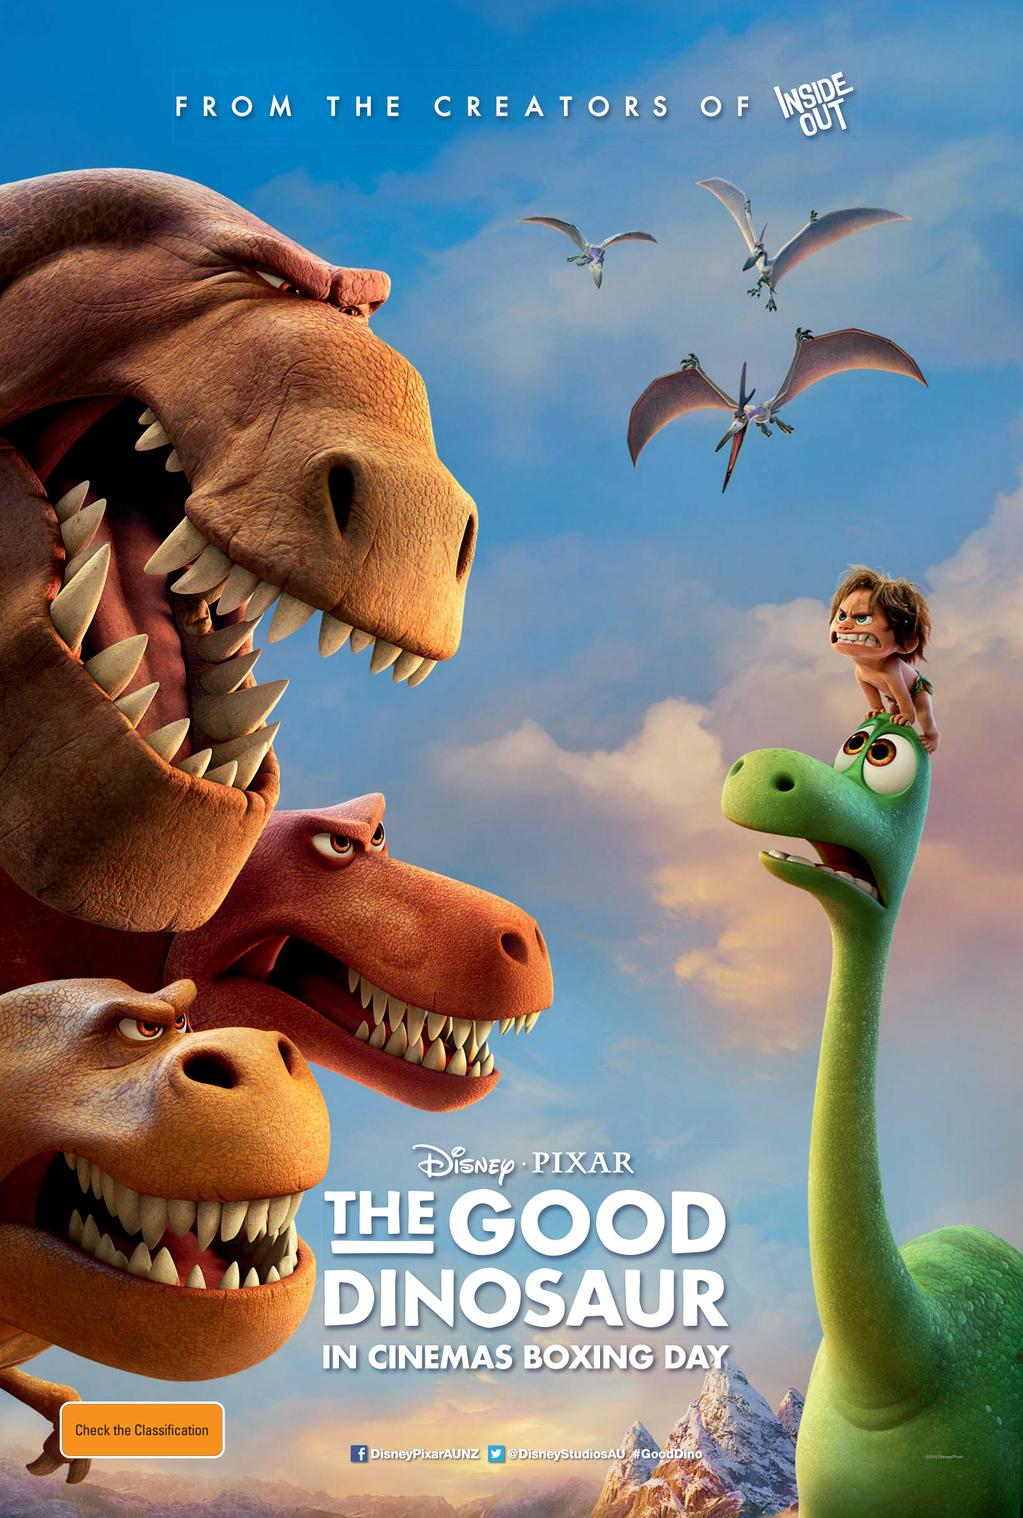 [Pixar%2BPost%2BThe%2BGood%2BDinosaur%2BAustralian%2BPromo%2BPoster]